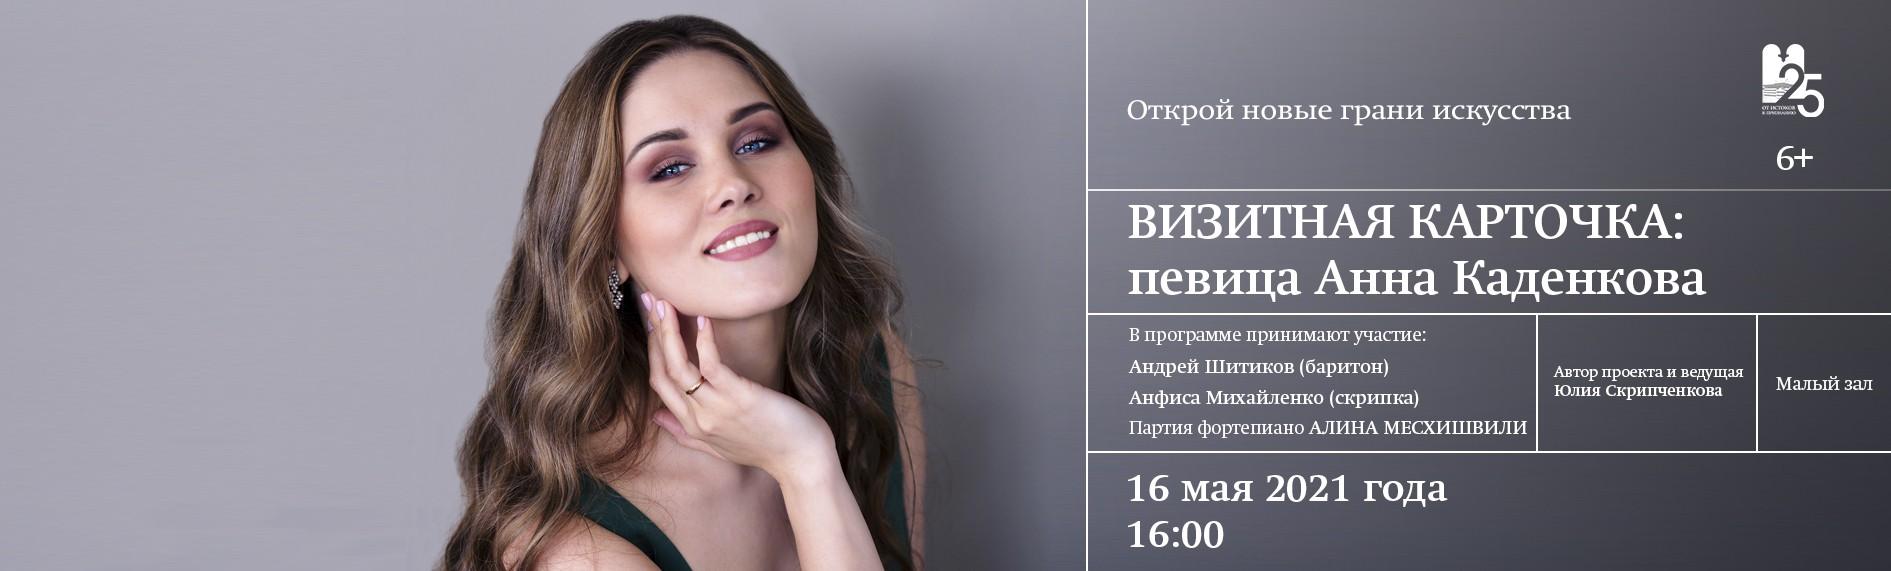 Анна Каденкова_16.05.21